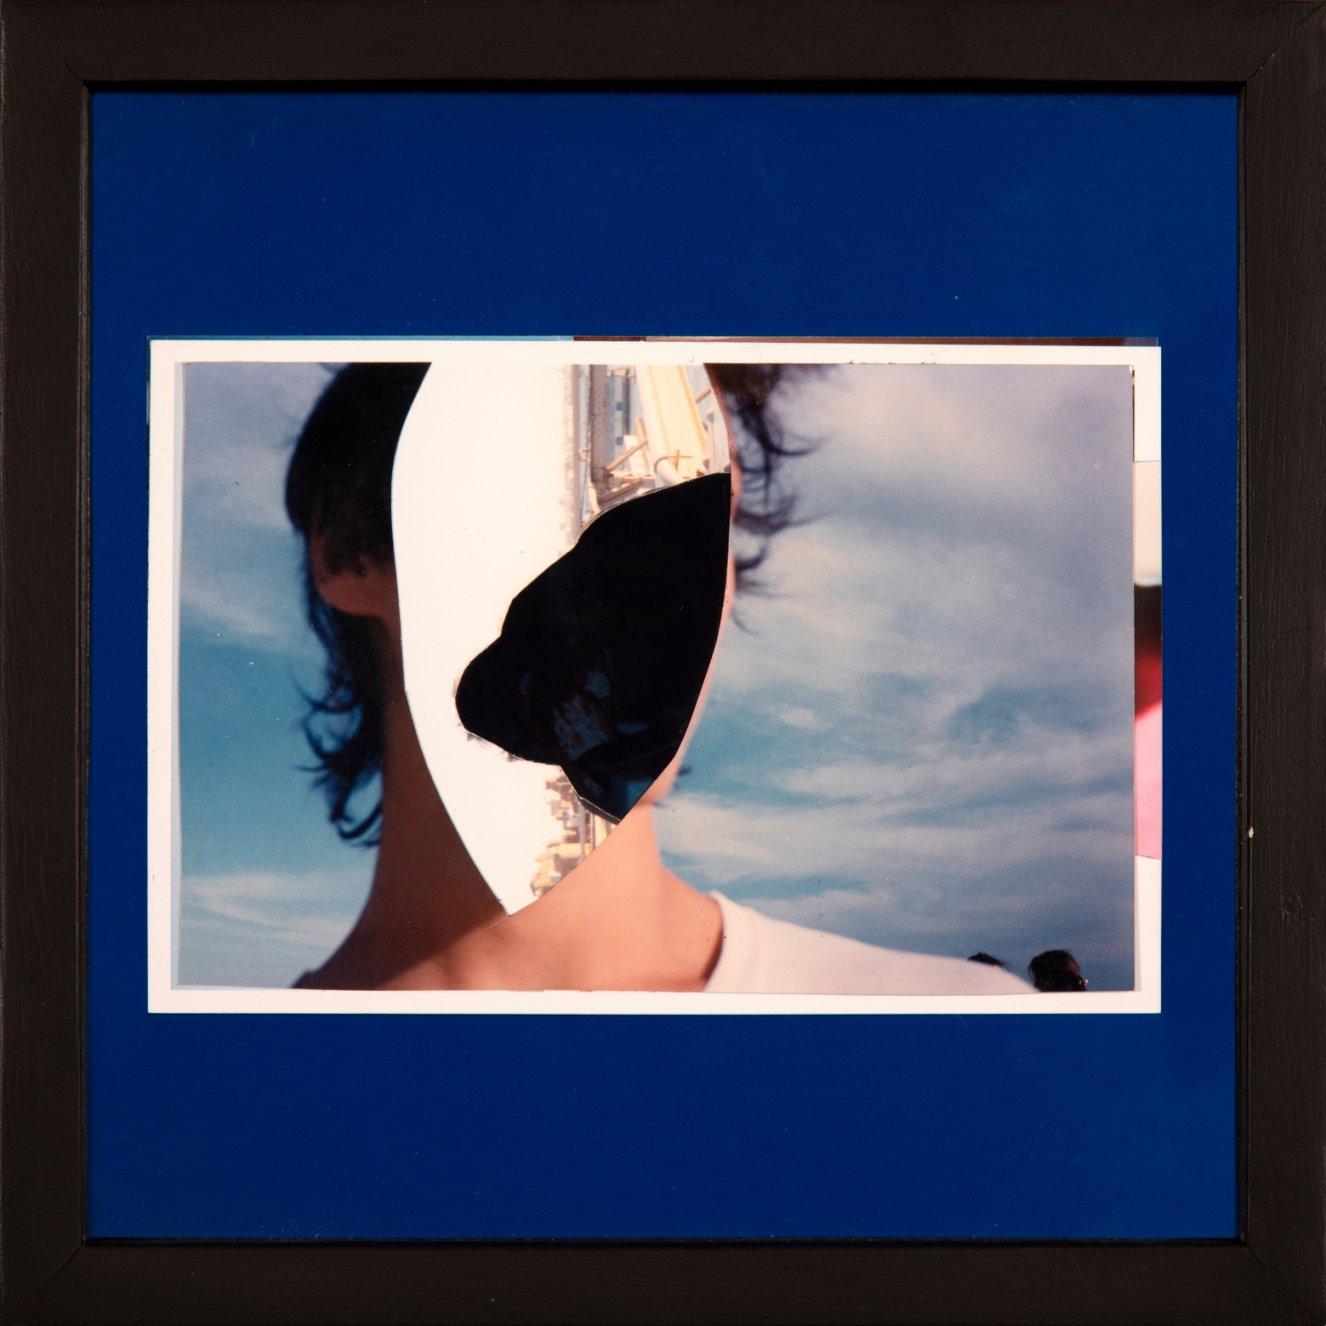 WIDR 18 (What I don't remember) (2016) - by Ohne Titel (Florence Drake Del Castillo)